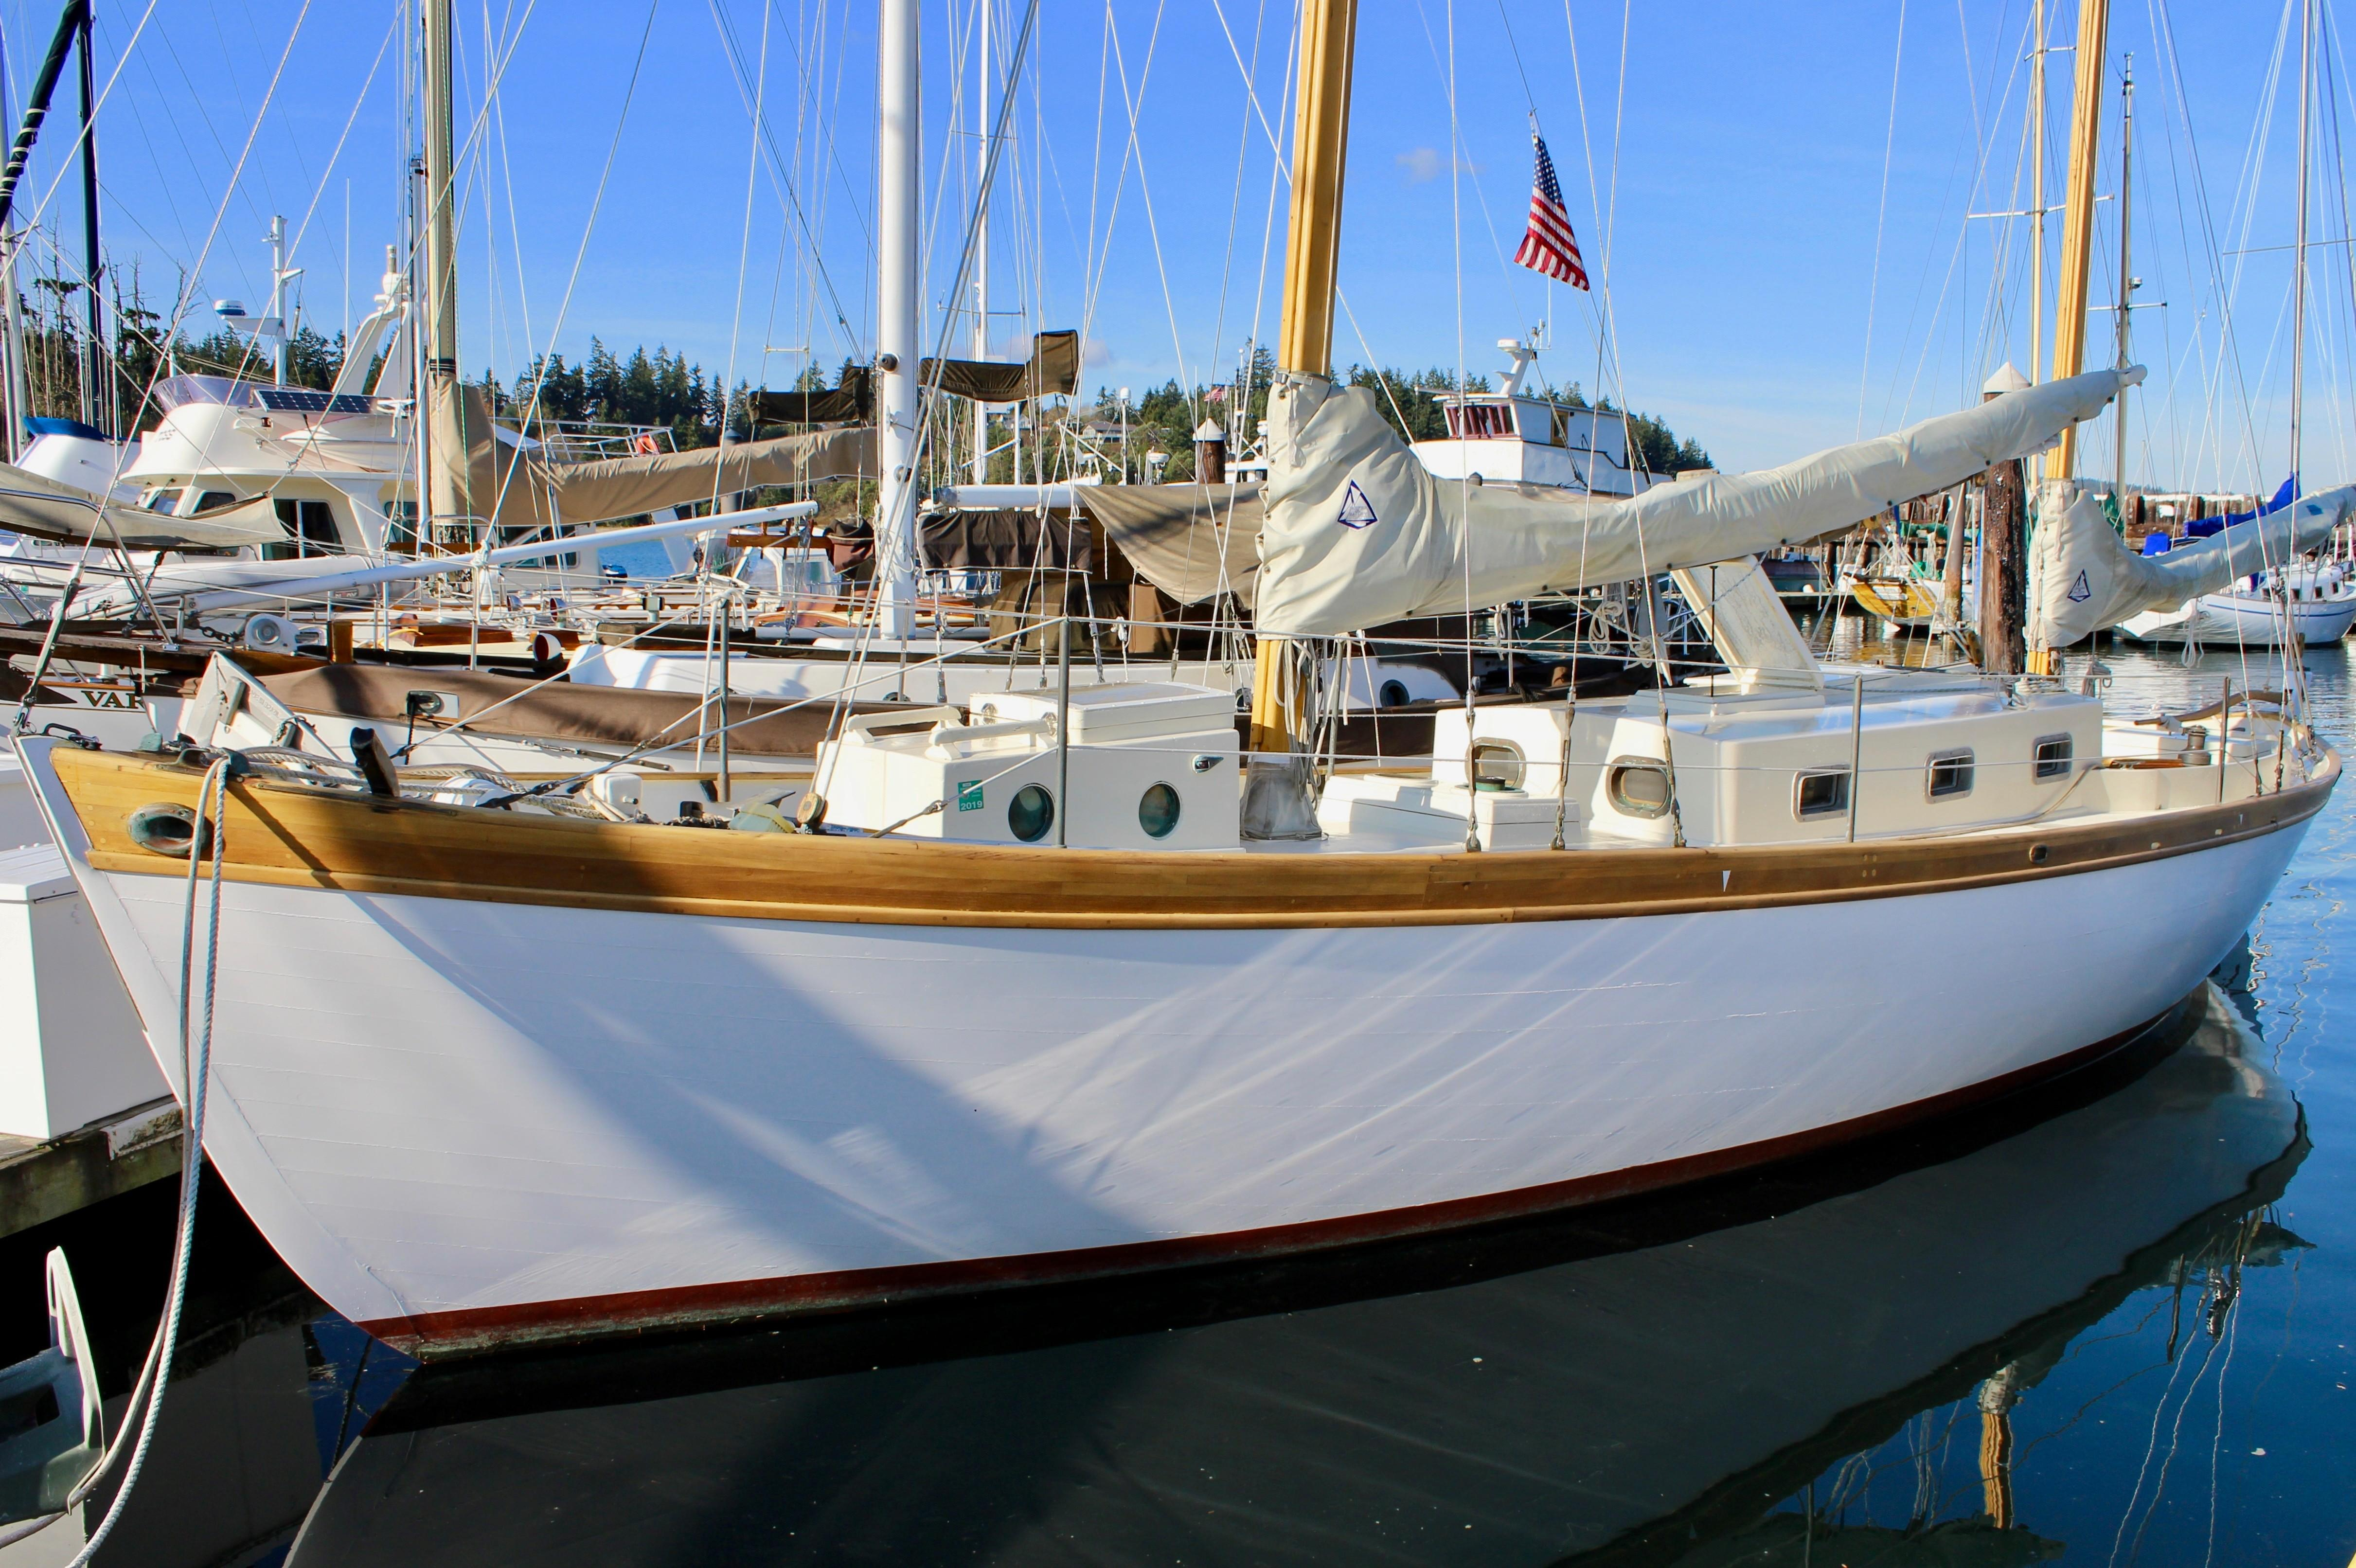 1964 Herreshoff 36 Sail Boat For Sale - www.yachtworld.com